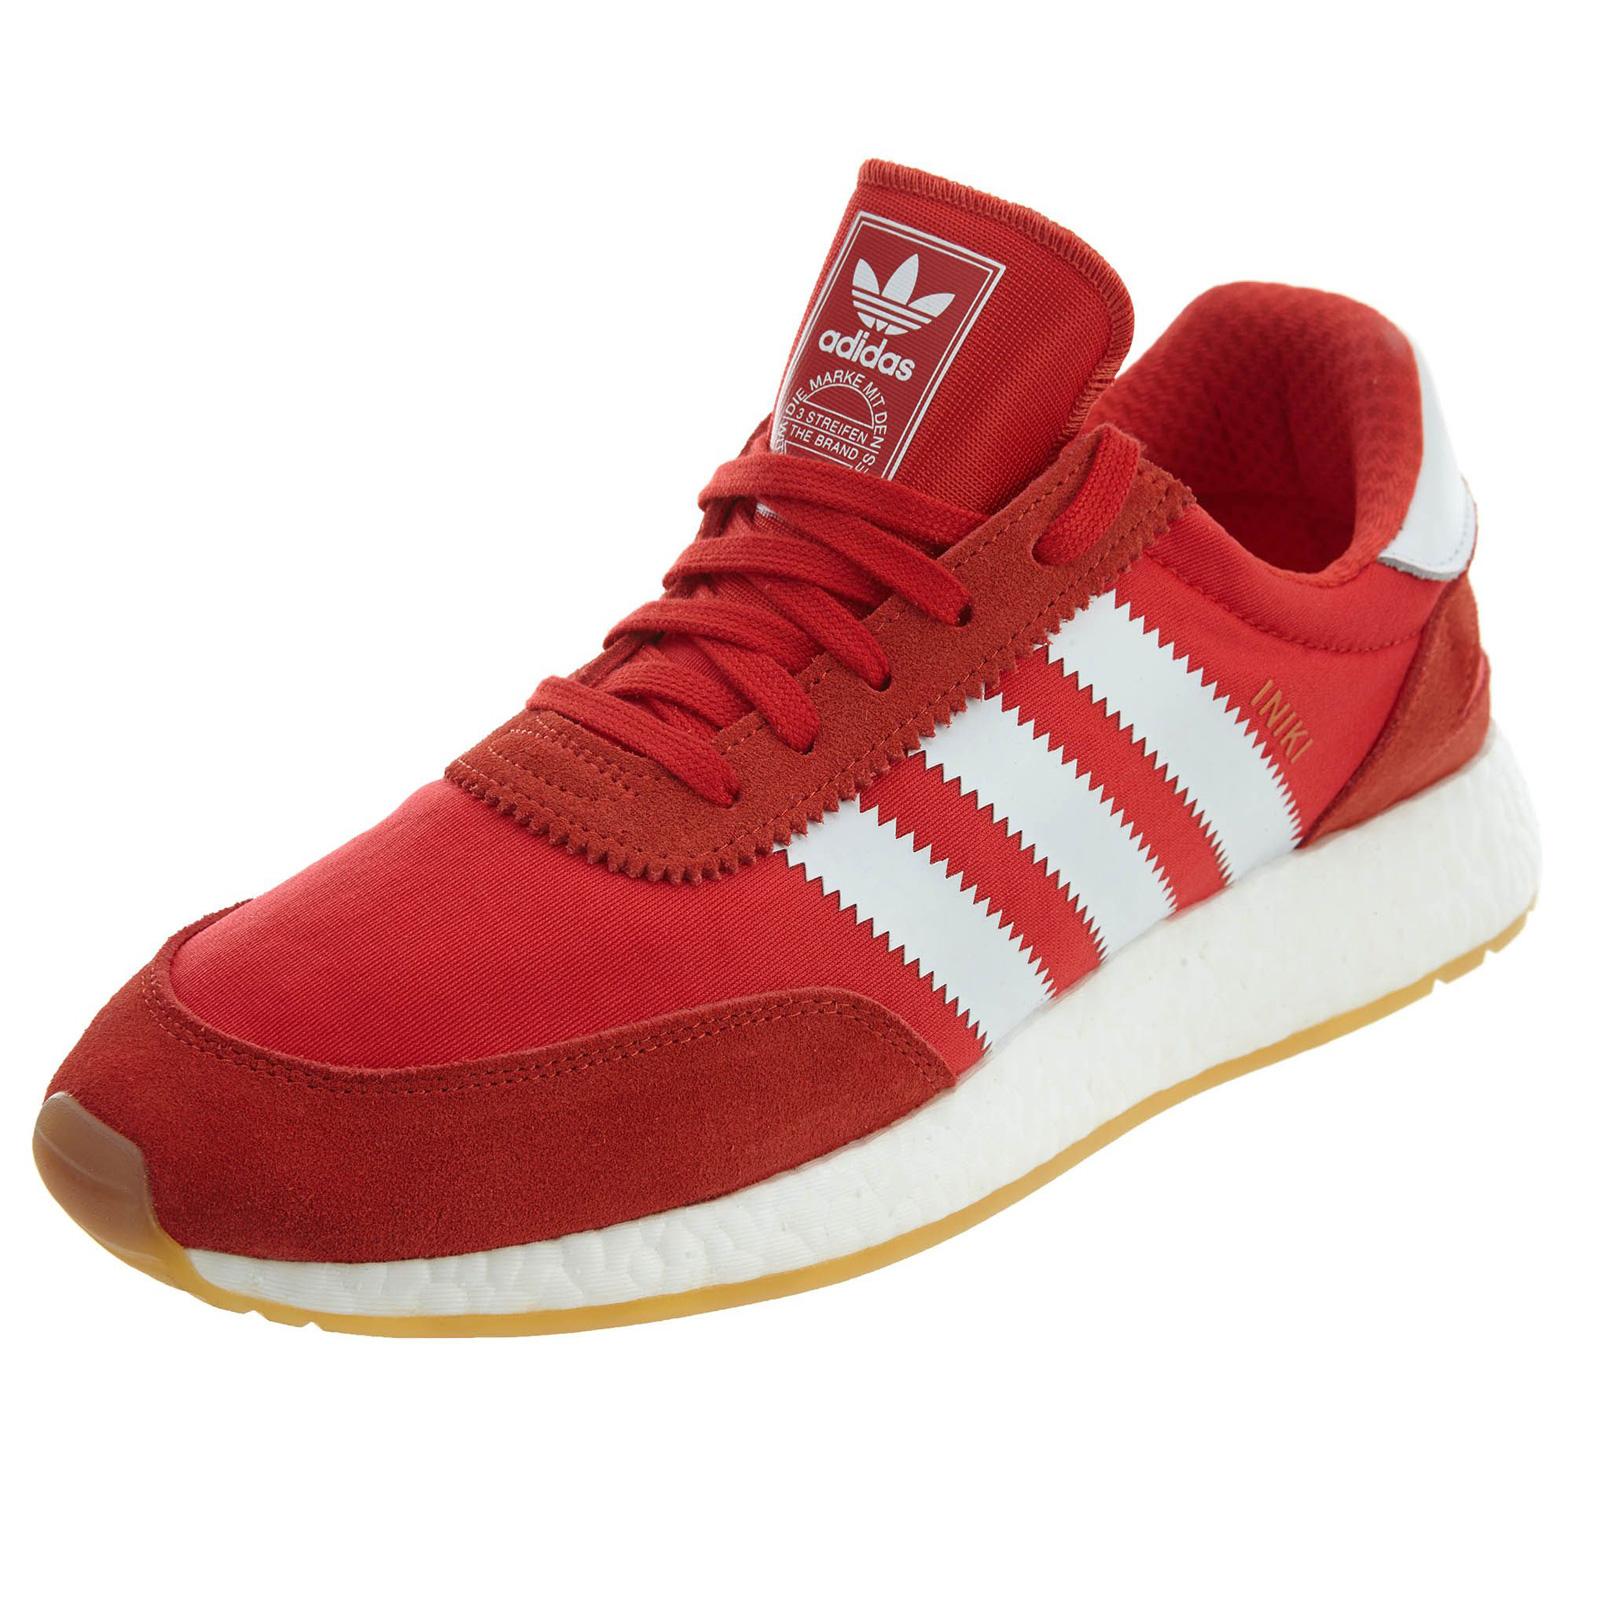 adidas Originals Iniki I 5923 Sneaker Turnschuhe Sportschuhe Schuhe BY9728 Rot